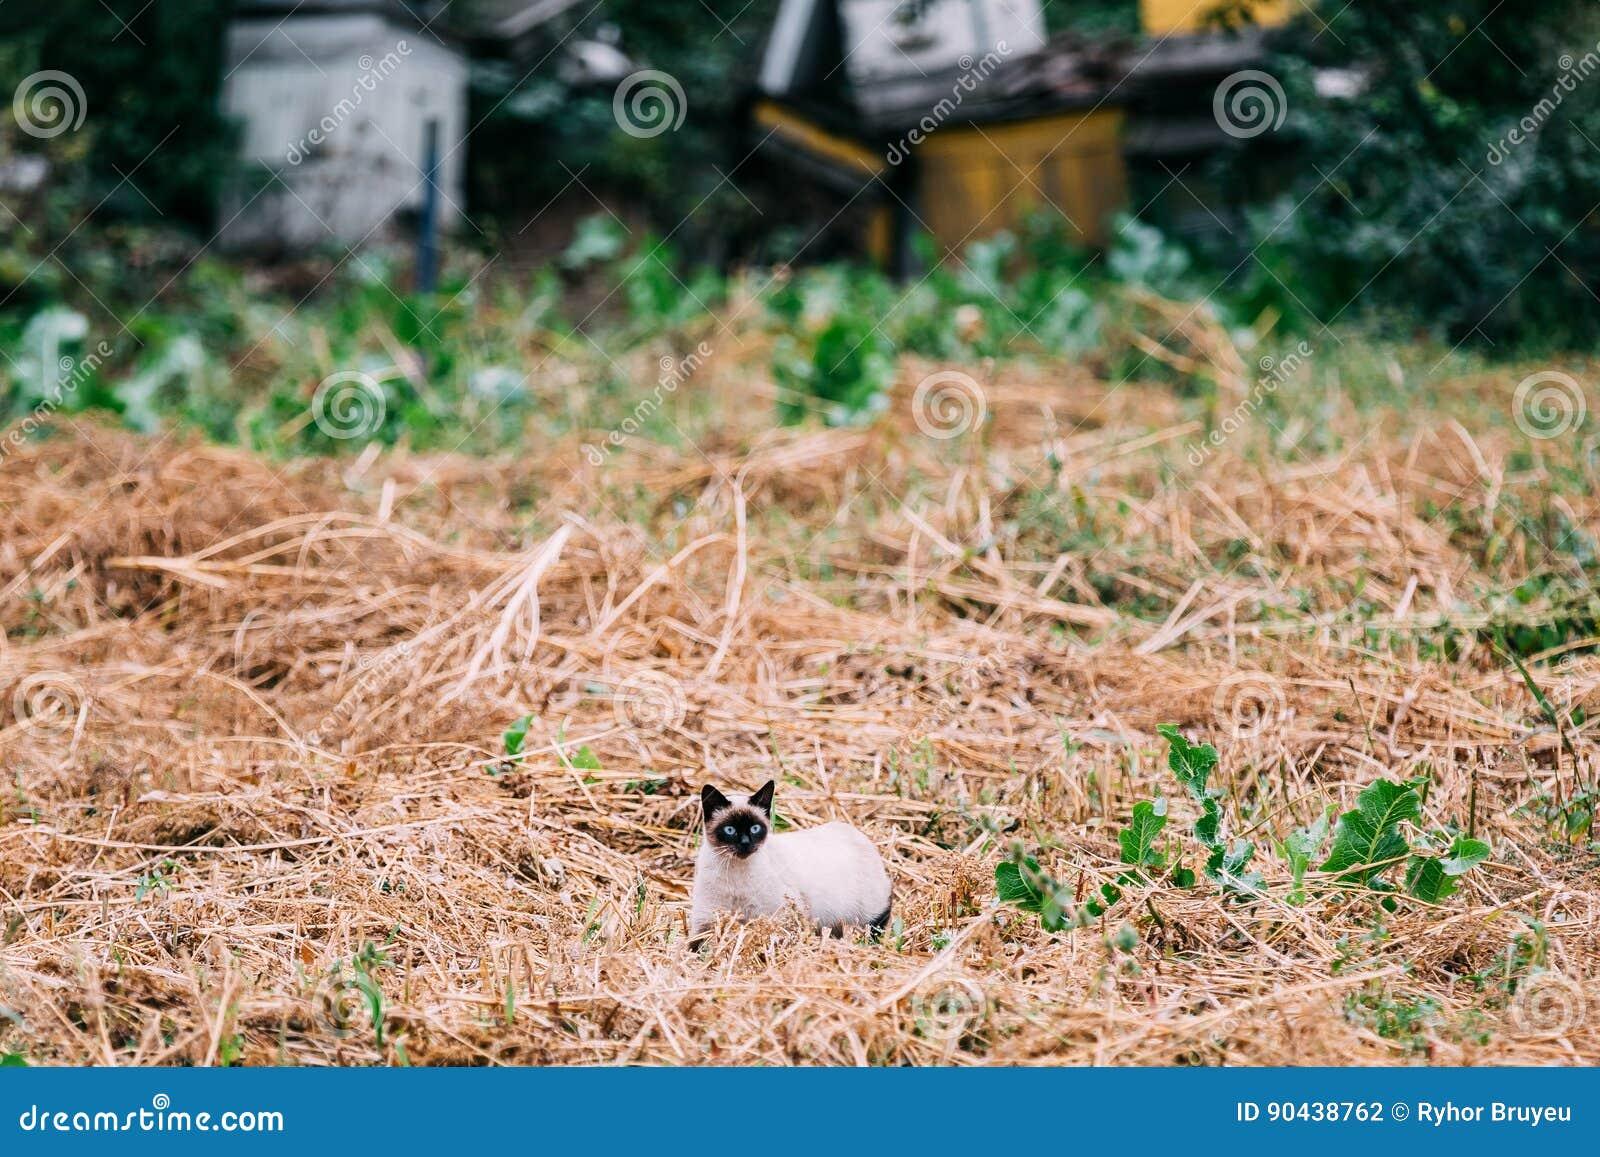 Cat Kitten Sit In Dry Grass Outdoor siamesa linda en Autumn Evening